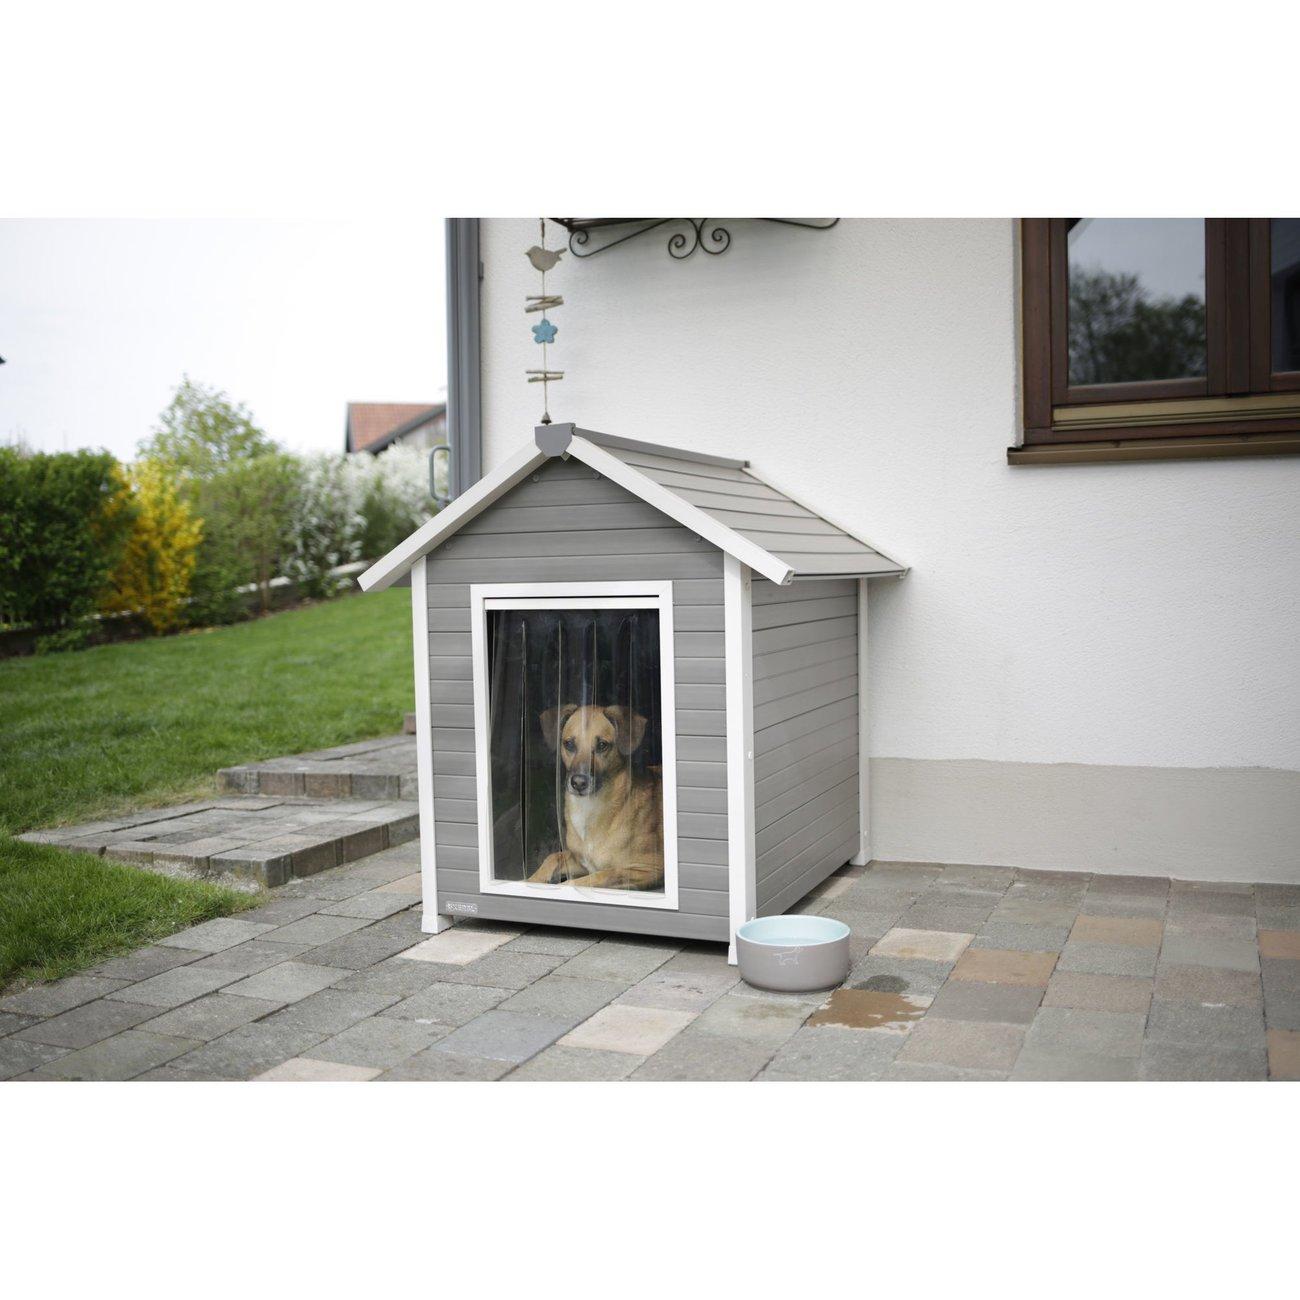 Kerbl Eco-Hundehütte Hendry, Bild 3